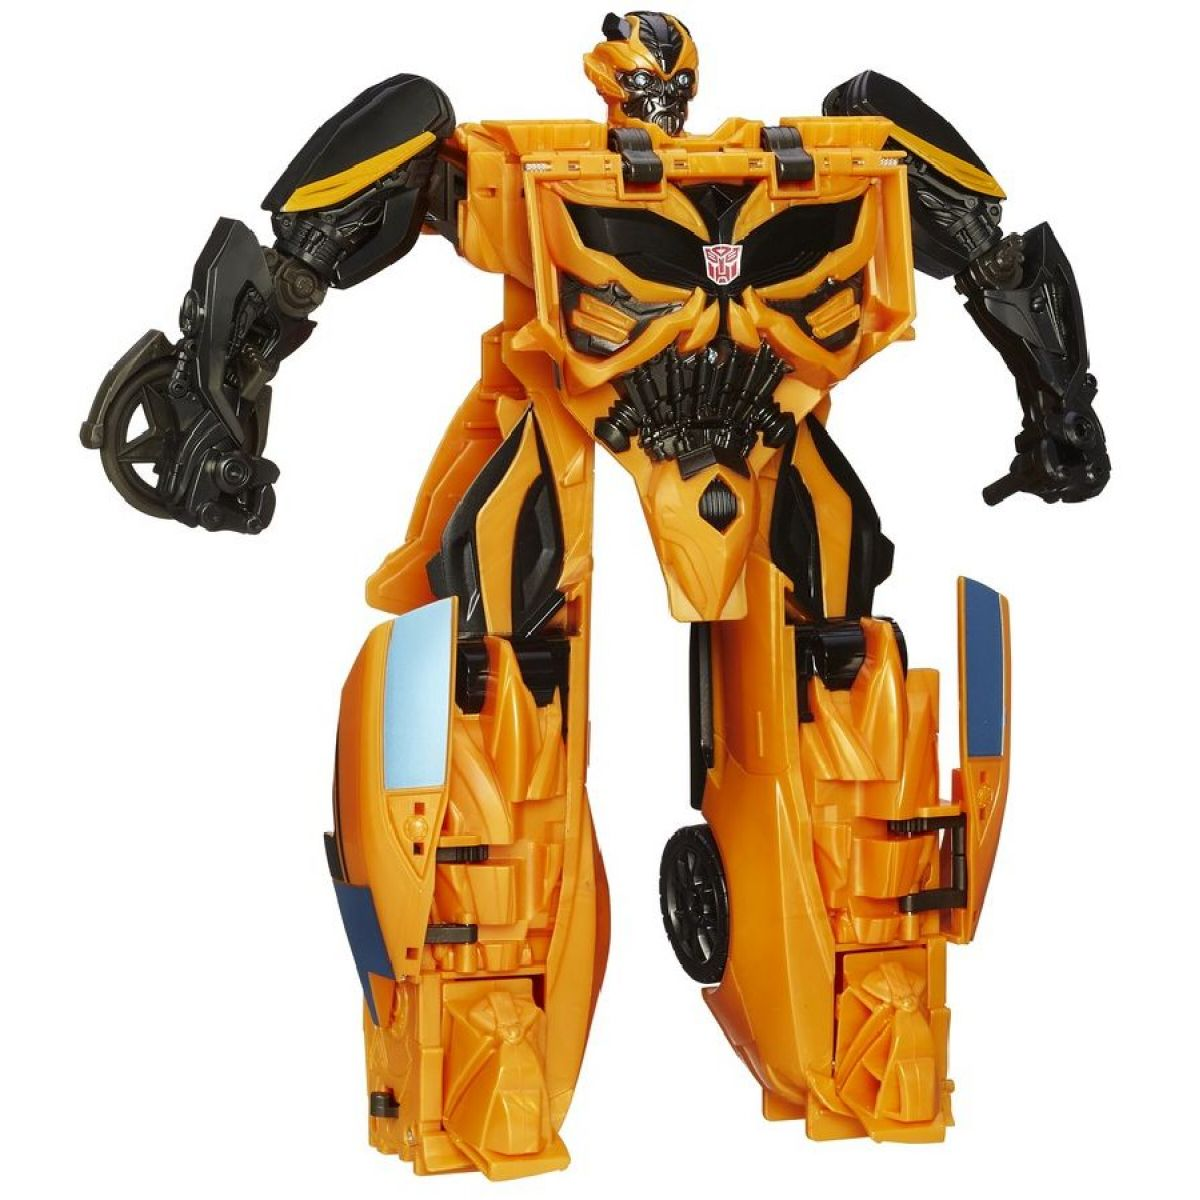 Transformers 4 Mega Bumblebee transformace v 1 kroku